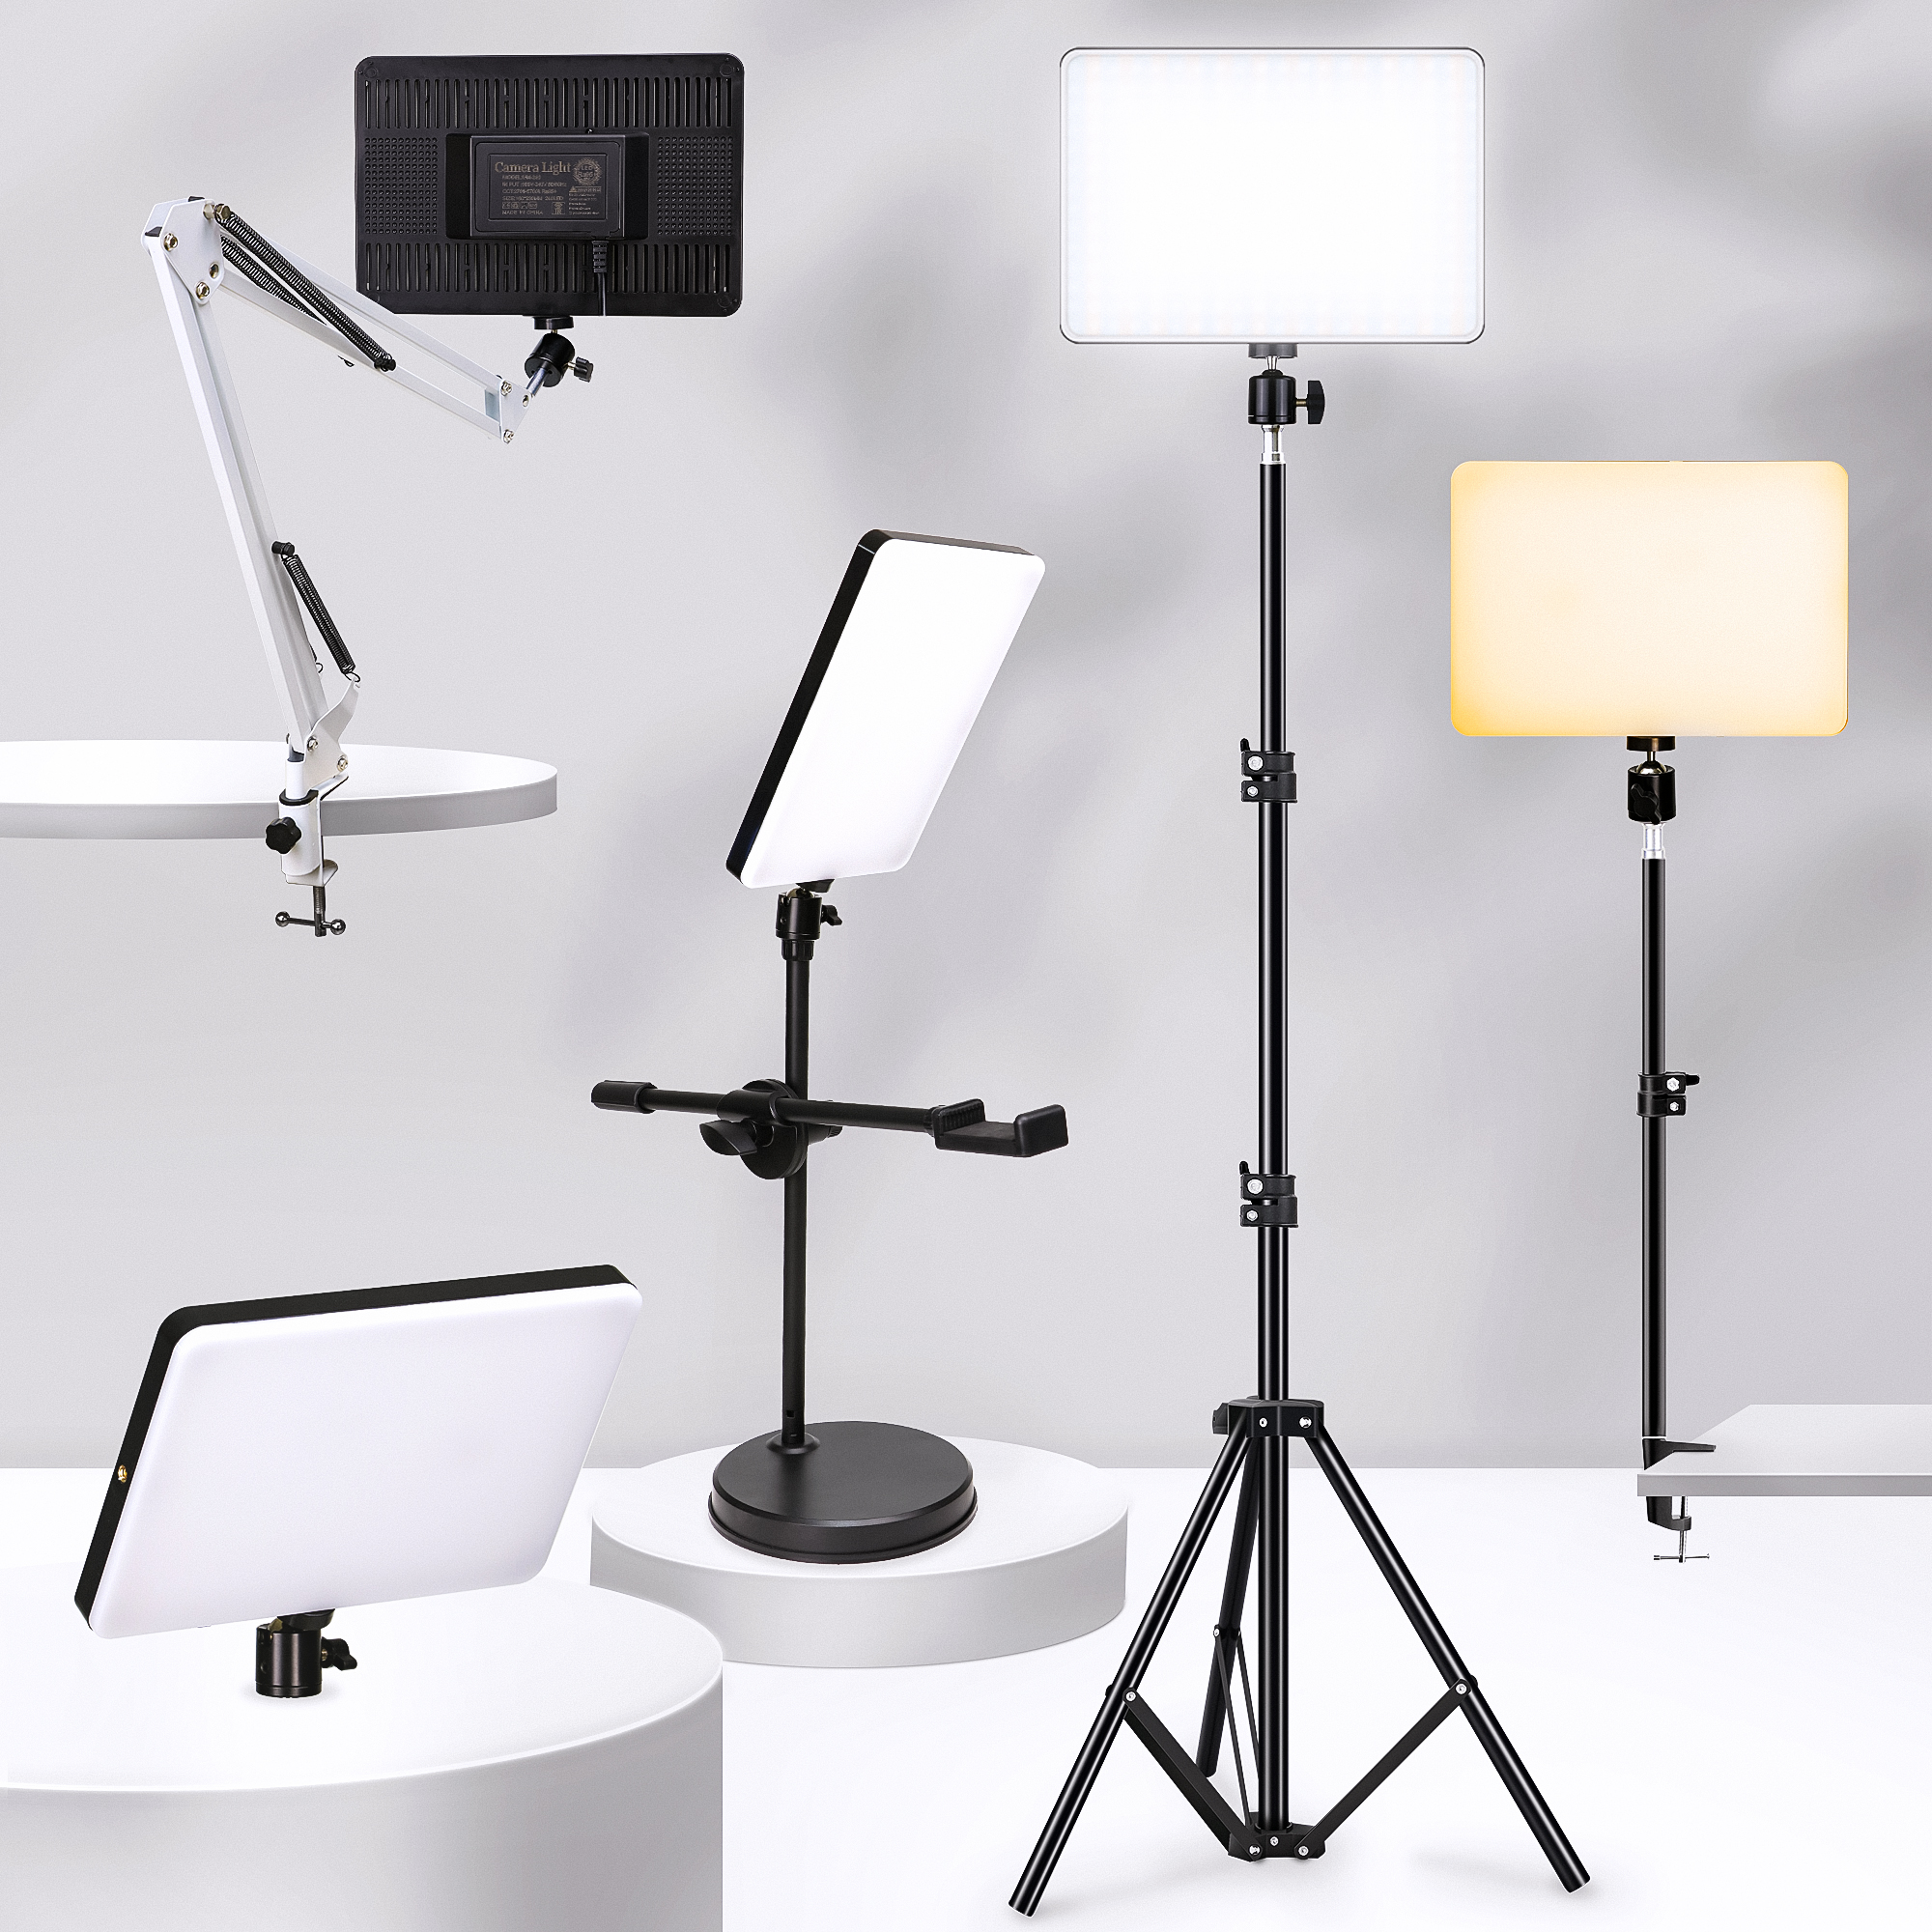 Dimmable LED Video Light Panel EU Plug 2700k 5700k Photography Lighting For Live Stream Photo Studio Dimmable LED Video Light Panel EU Plug 2700k-5700k Photography Lighting For Live Stream Photo Studio Fill Lamp Three Color